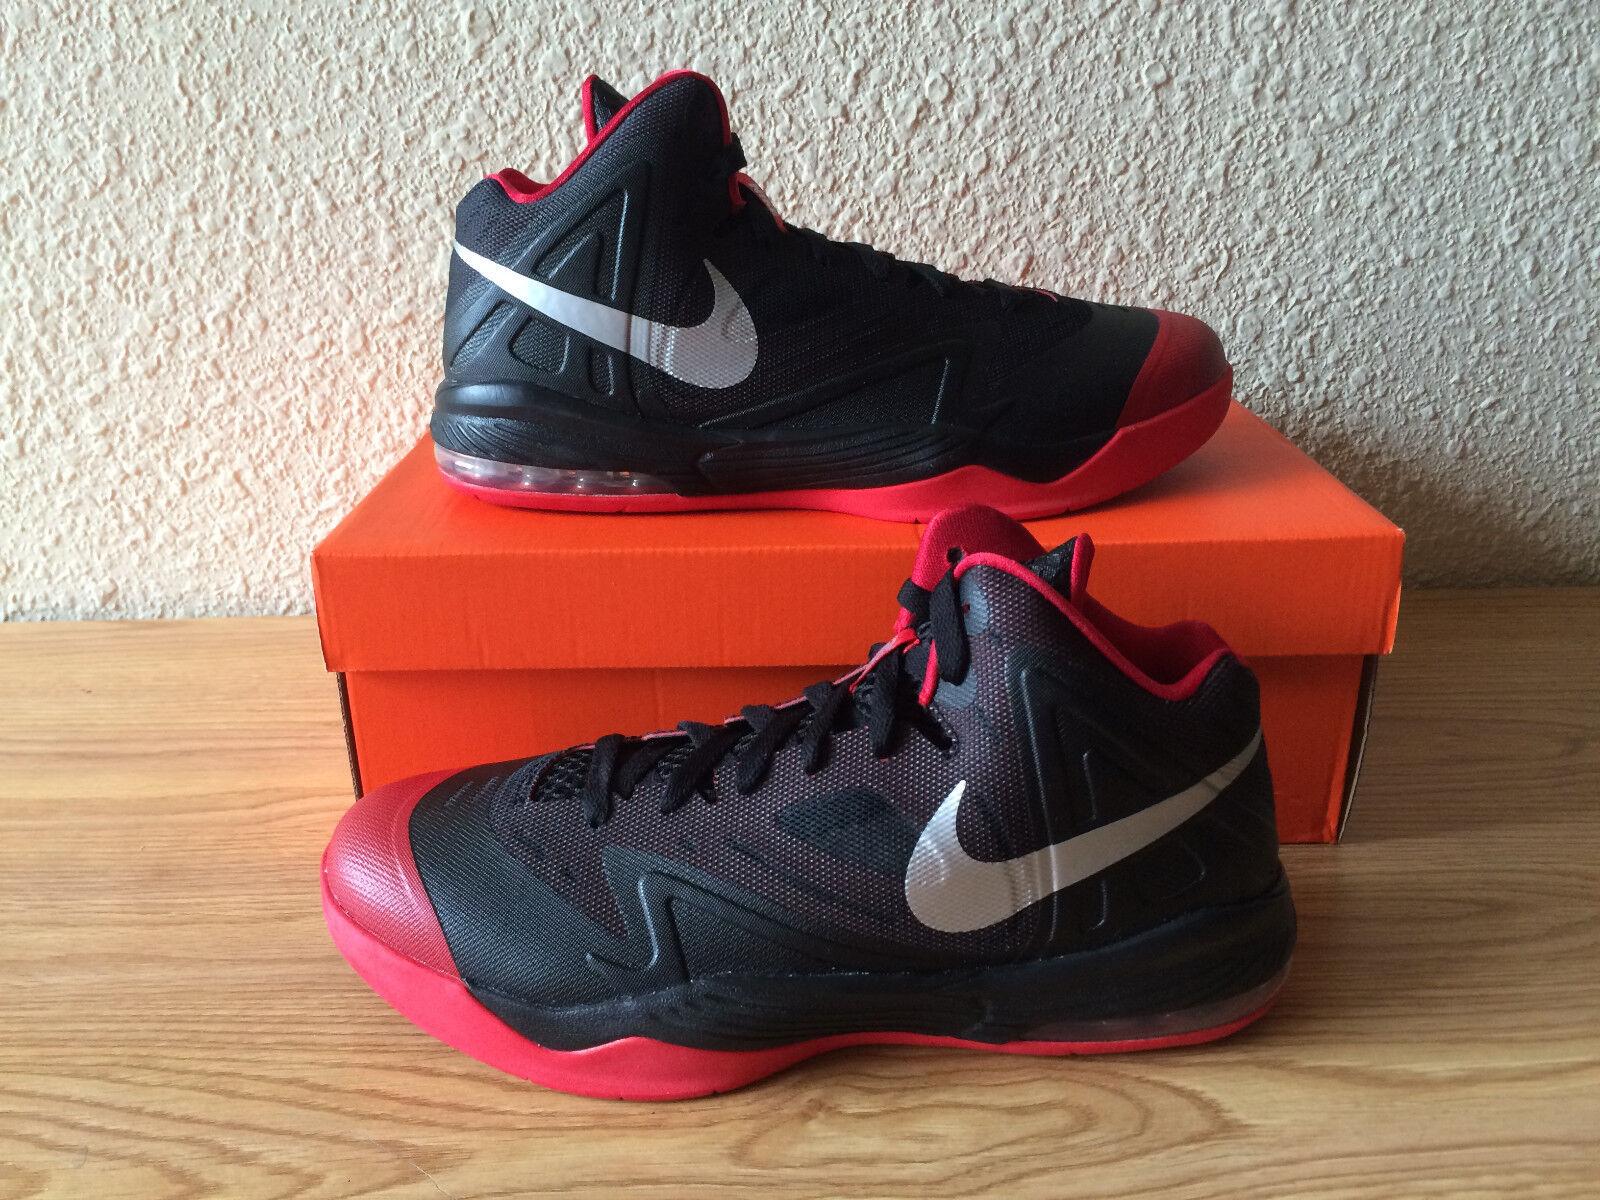 New Nike AIX MAX PREMIERE Men's Basketball Black Shoes 653638 006